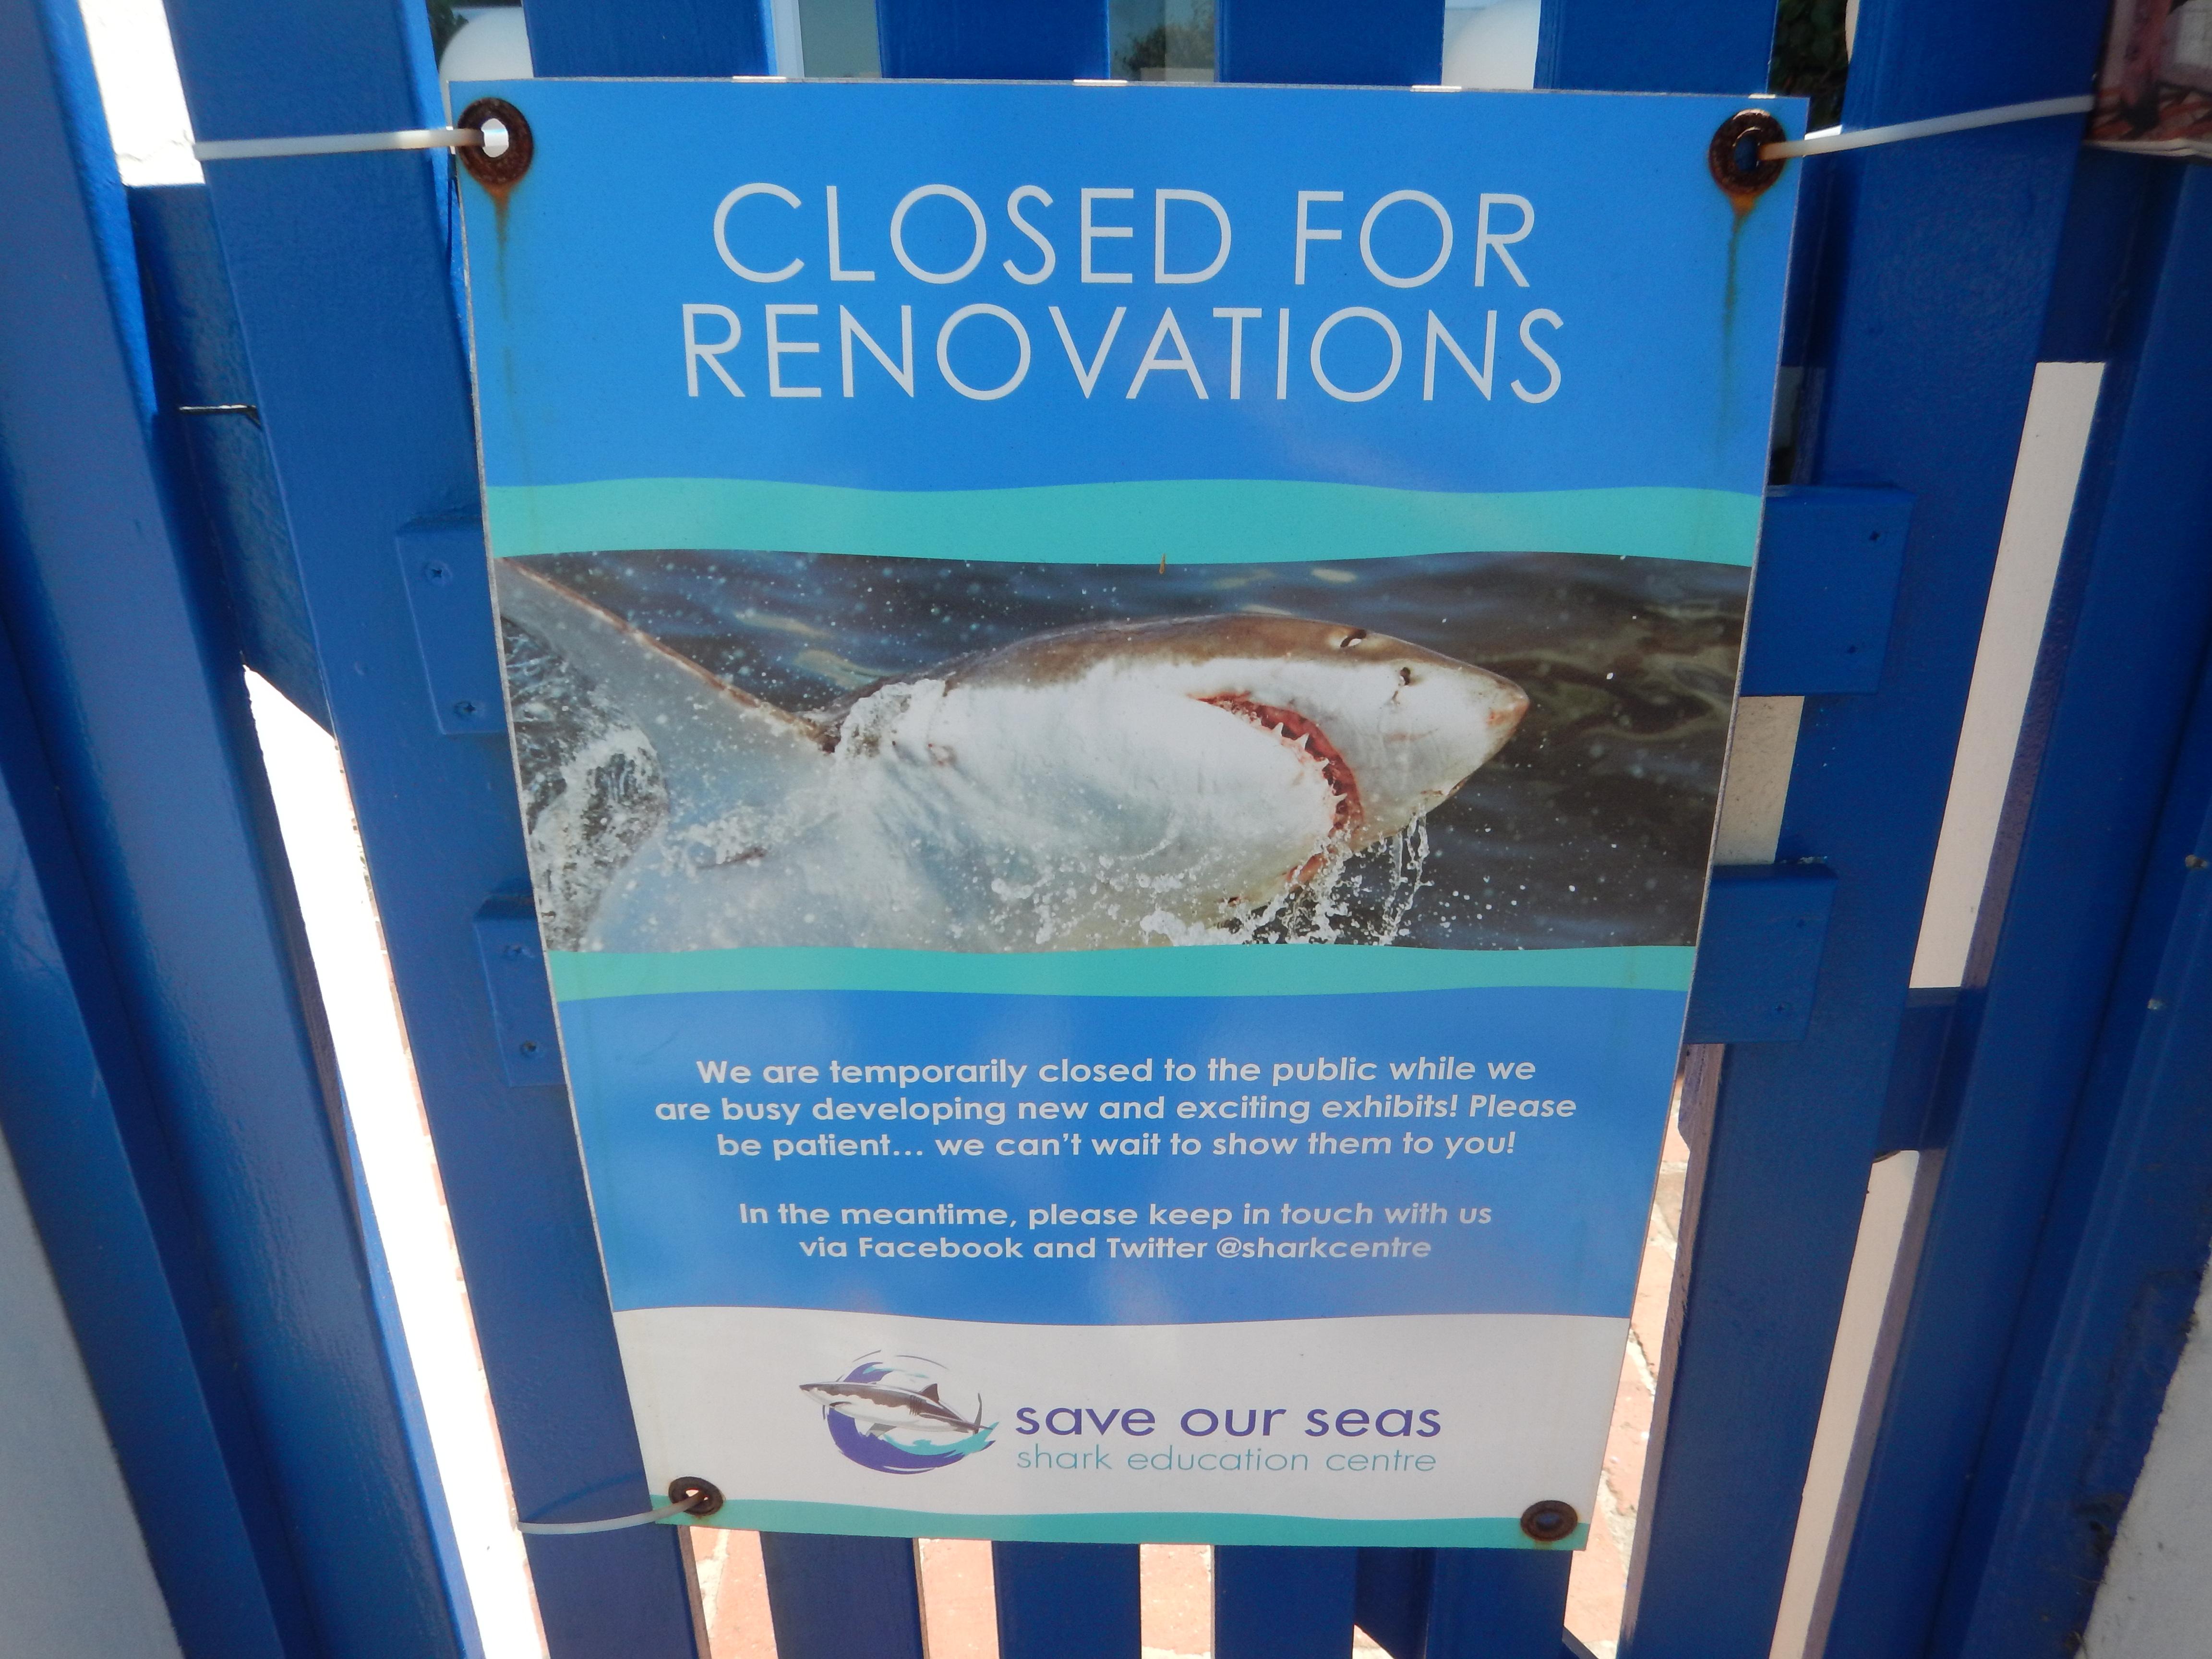 renovations sign